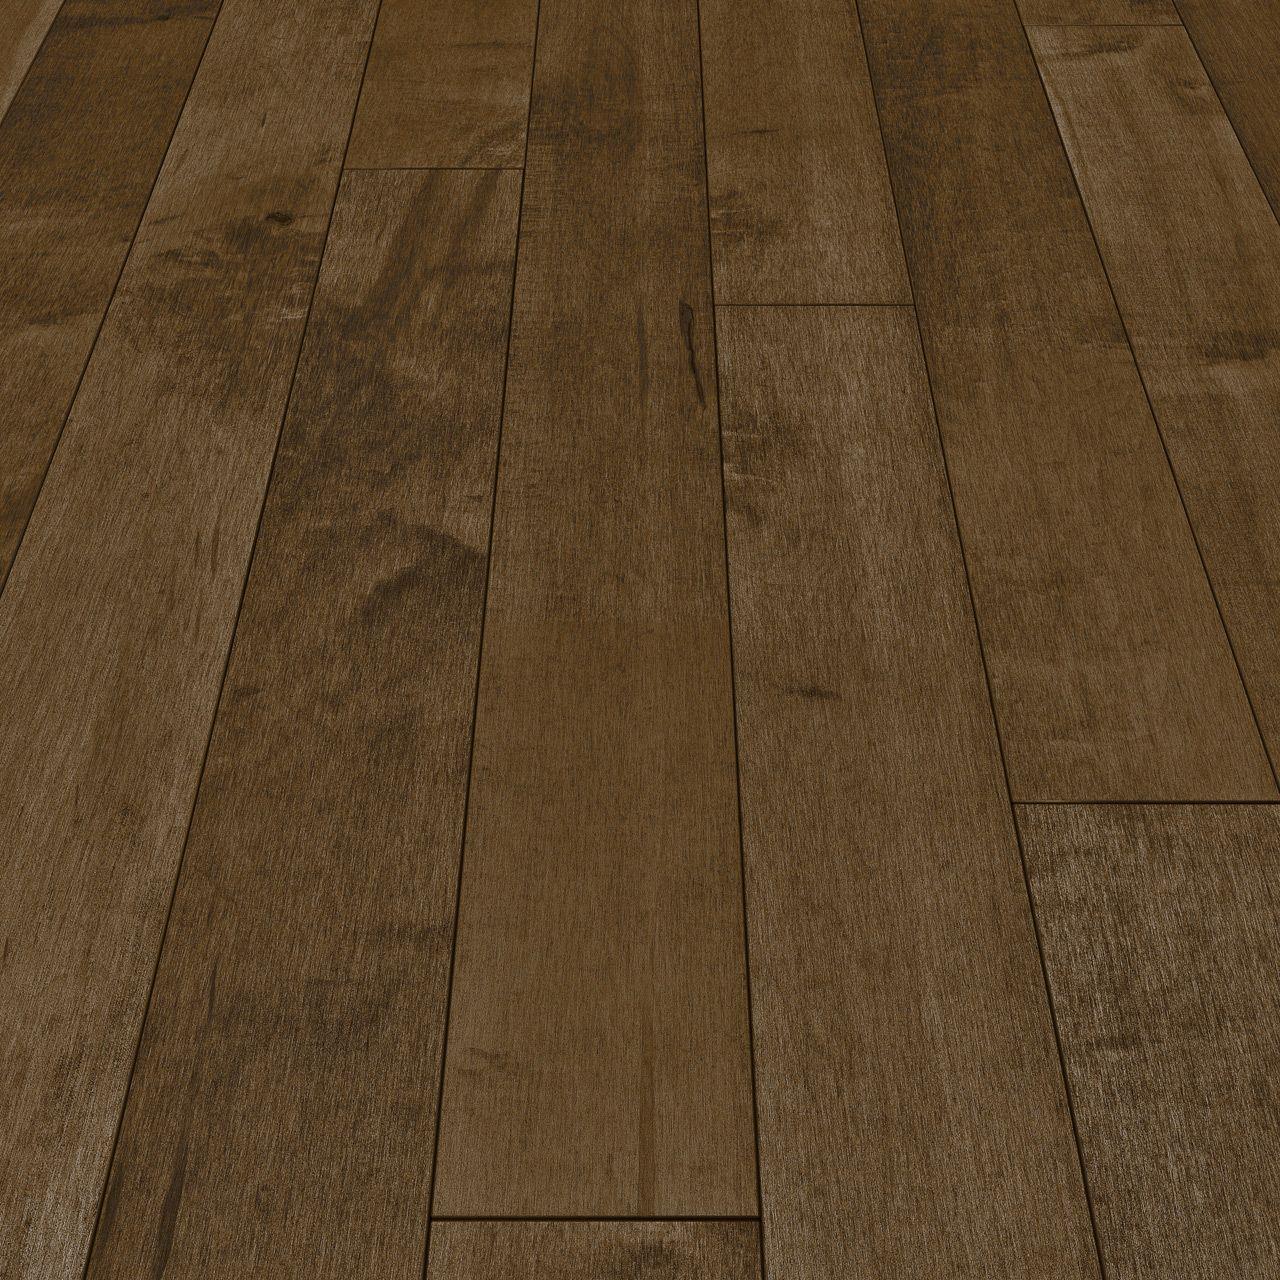 hard maple, truffe, oiled hardwood flooring